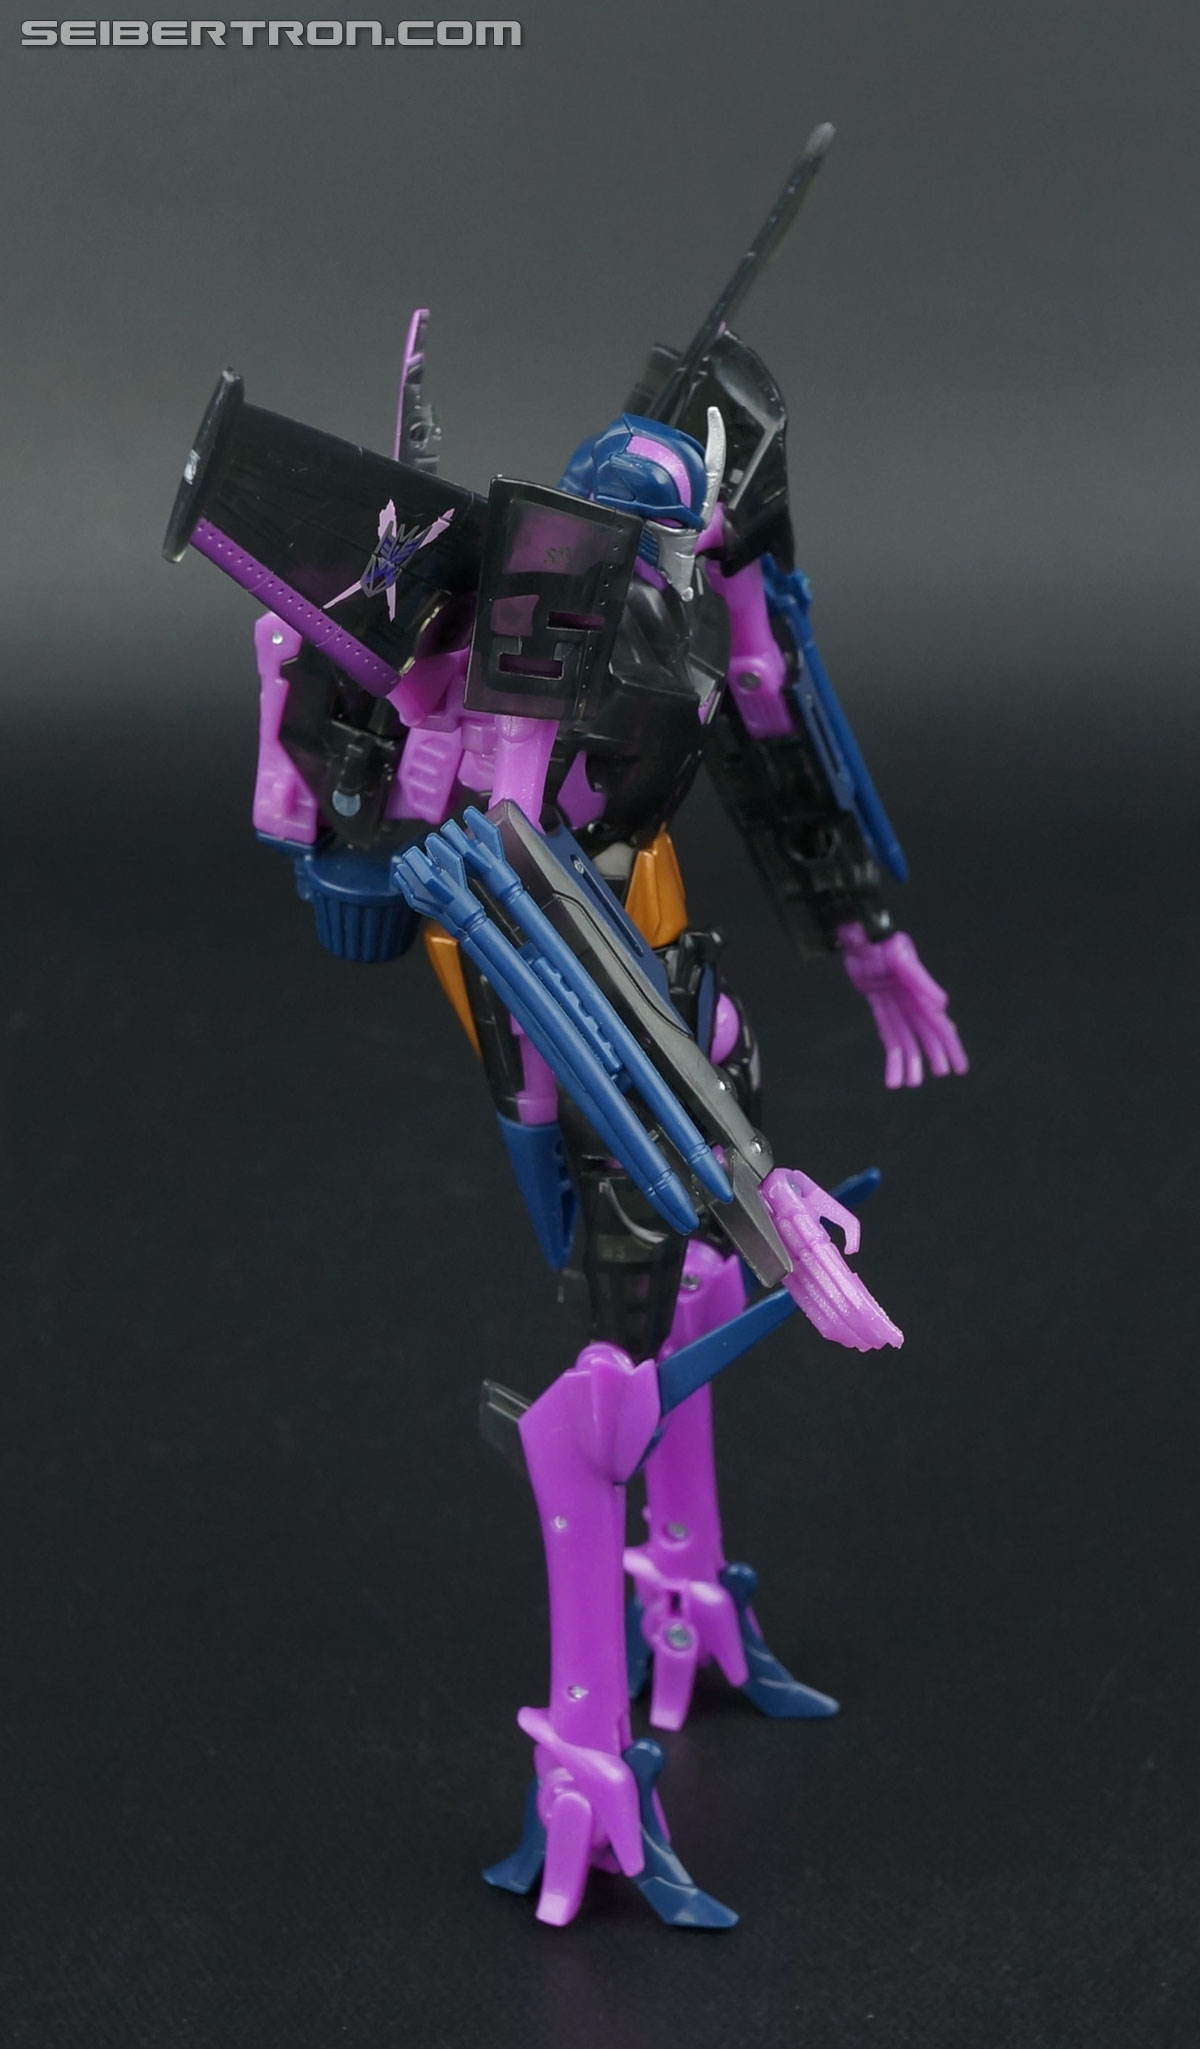 Transformers Prime: Robots In Disguise Dark Energon Starscream (Image #74 of 128)